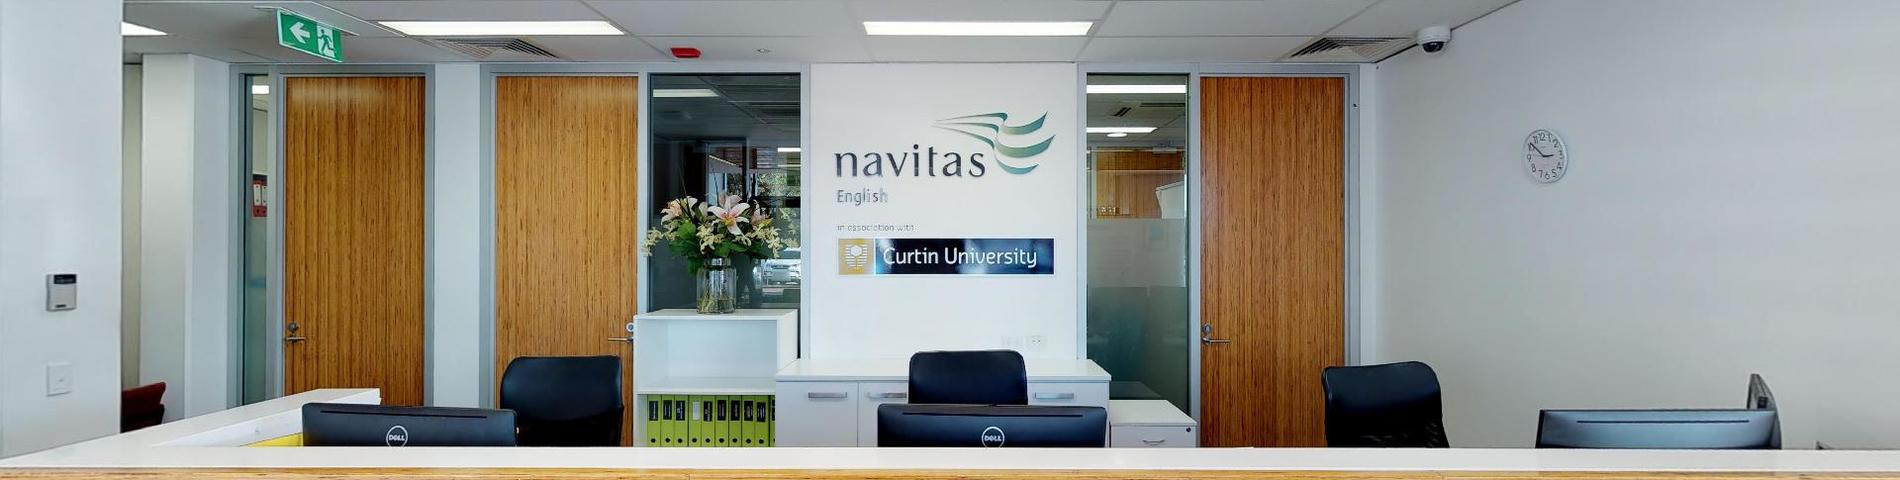 Navitas English зображення 1